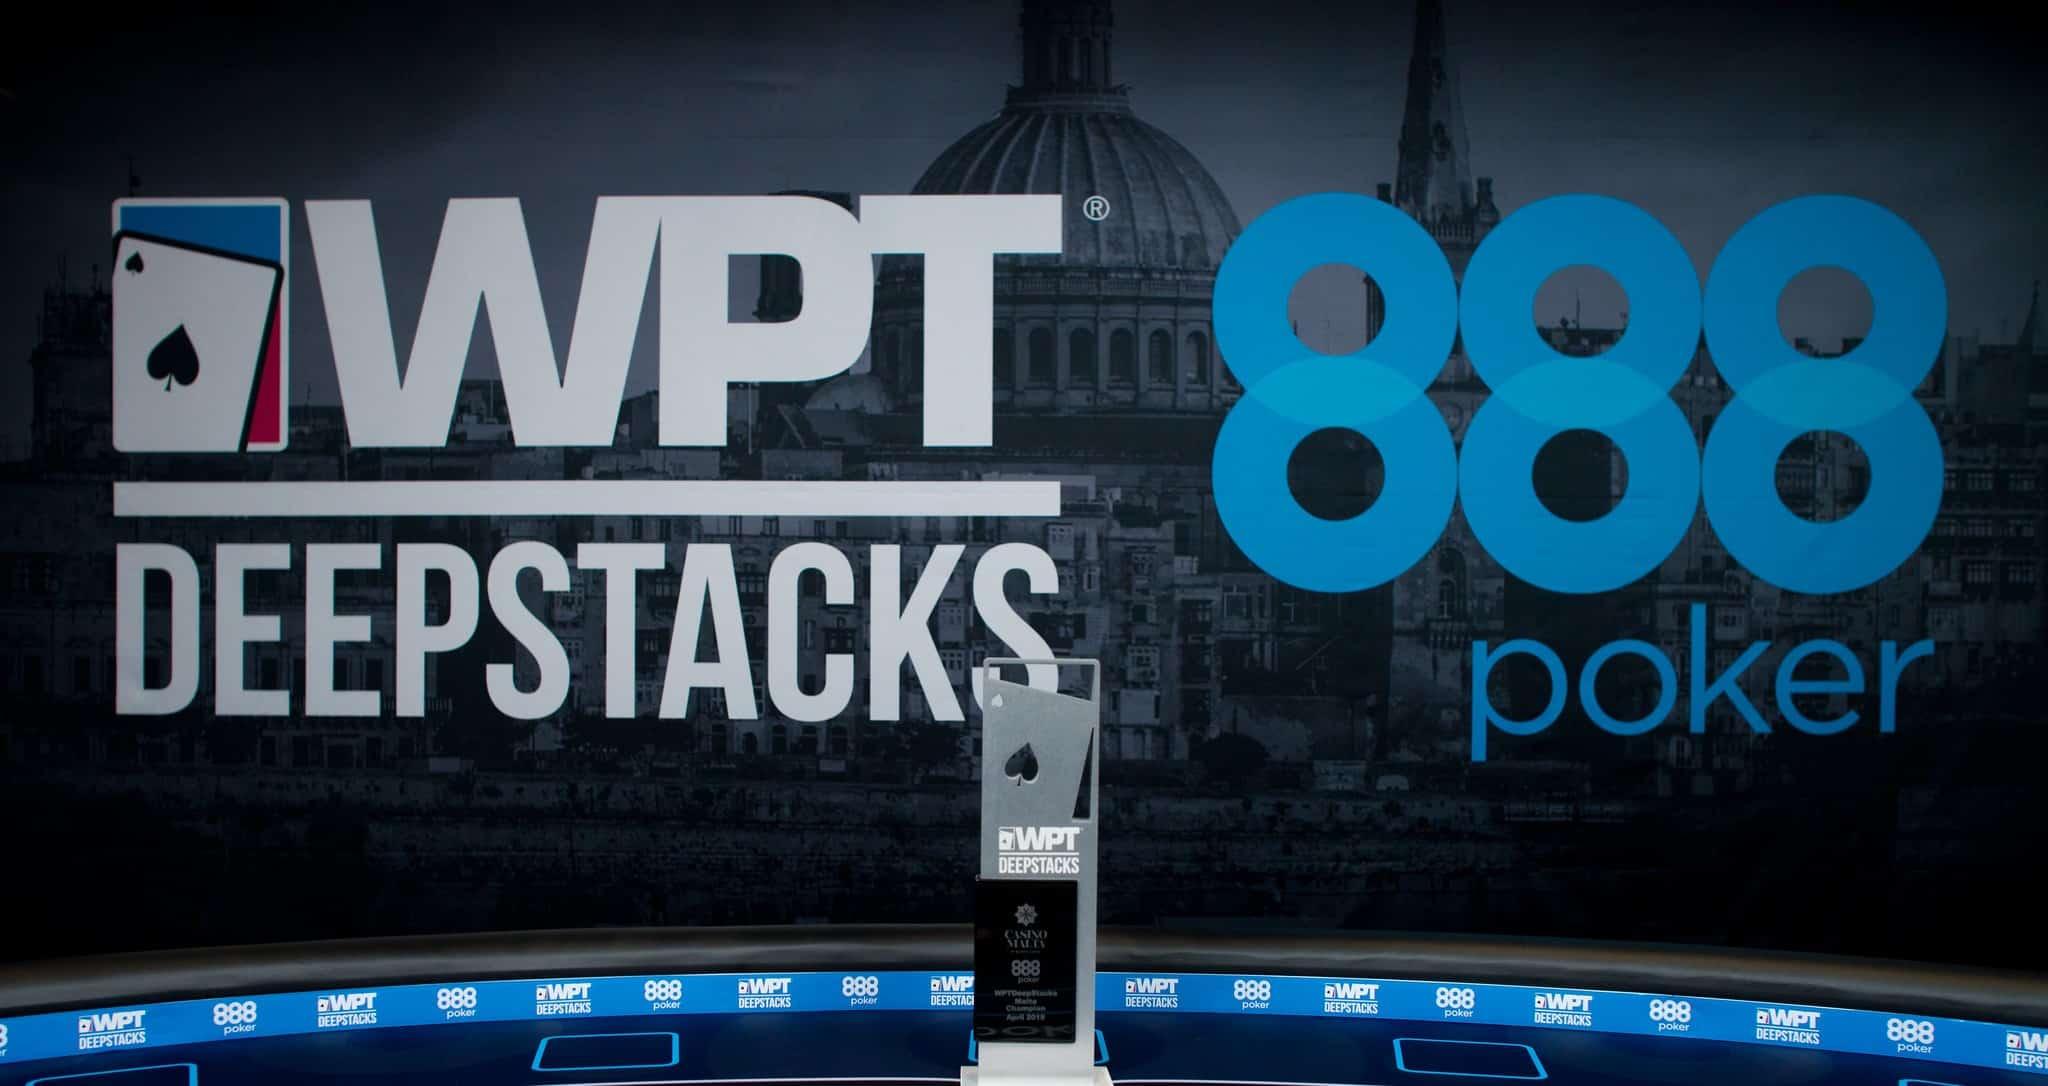 В апреле на 888poker пройдет сразу три онлайн-серии WPTDeepStacks